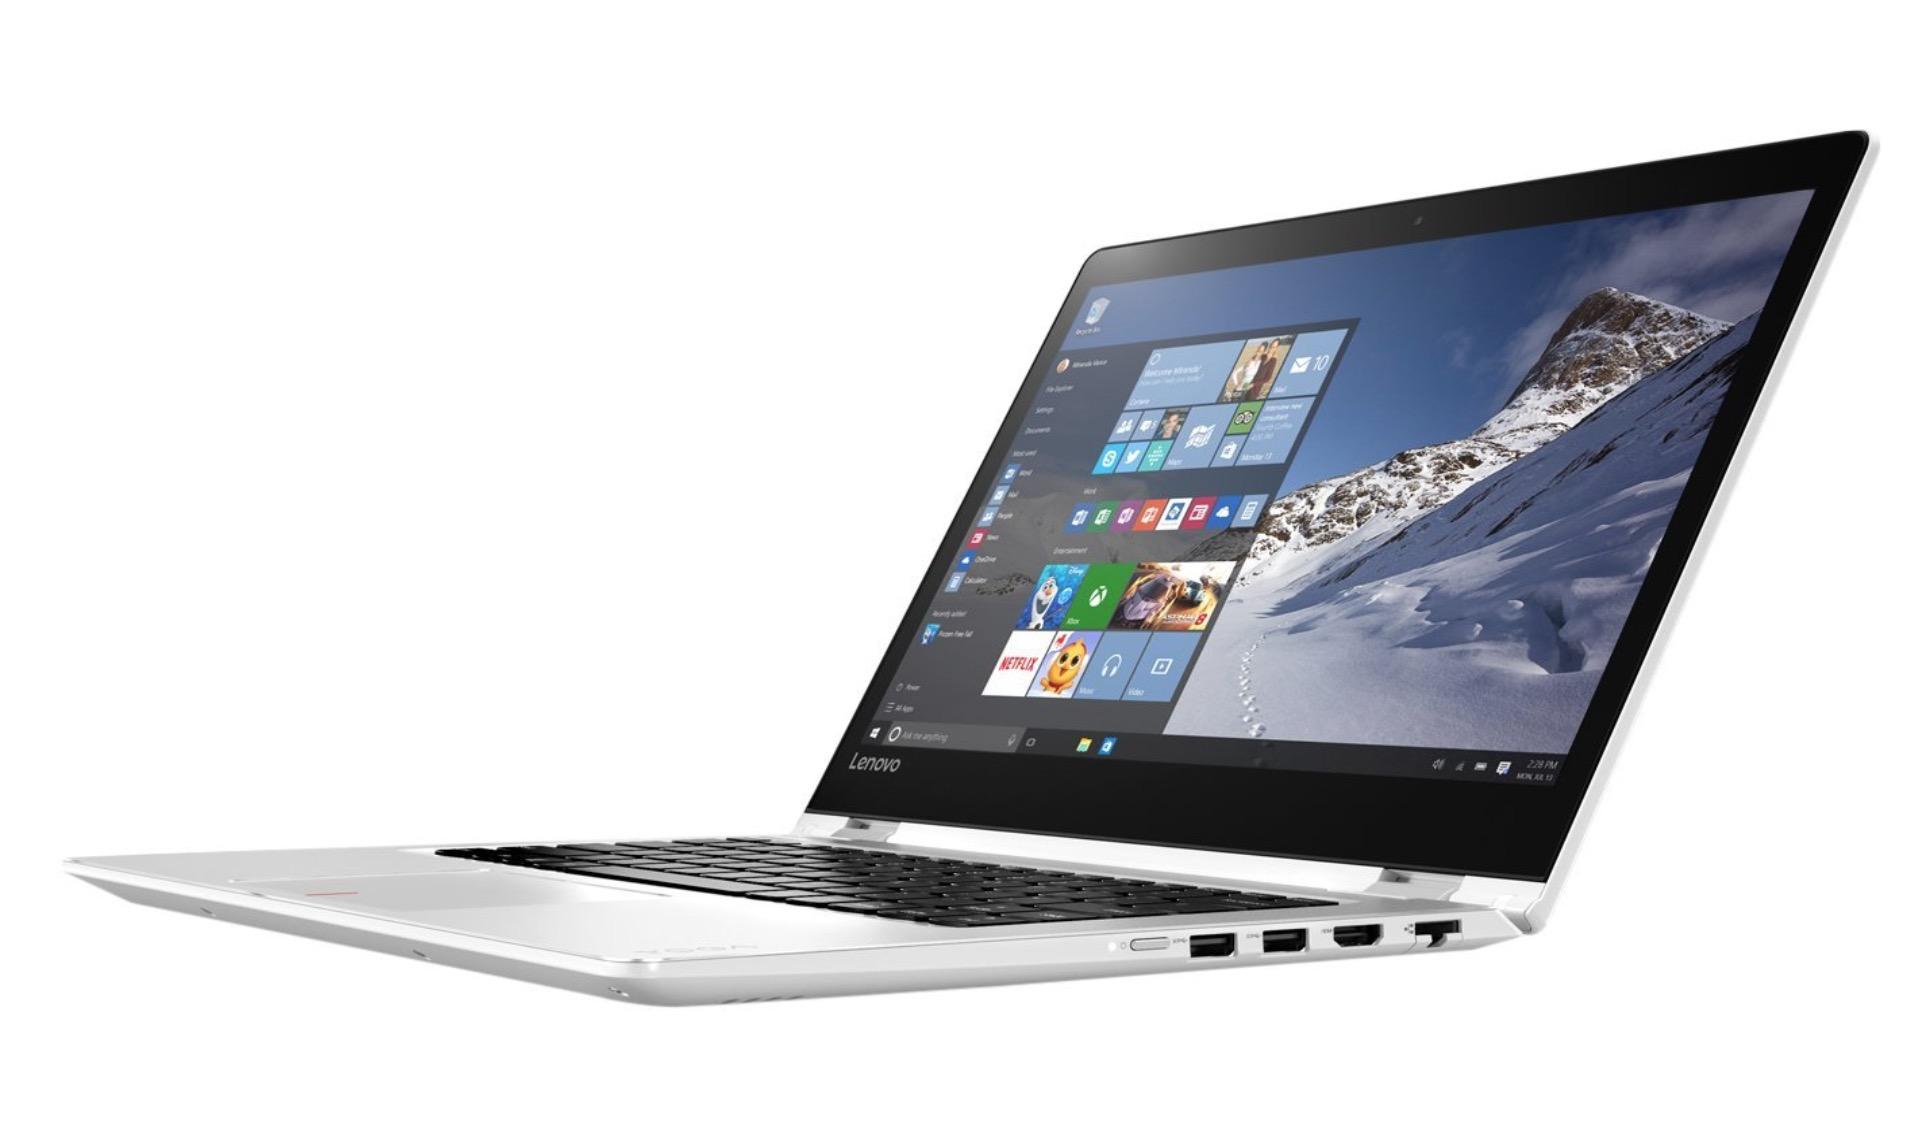 Lenovo Yoga 510 14IKB notebook